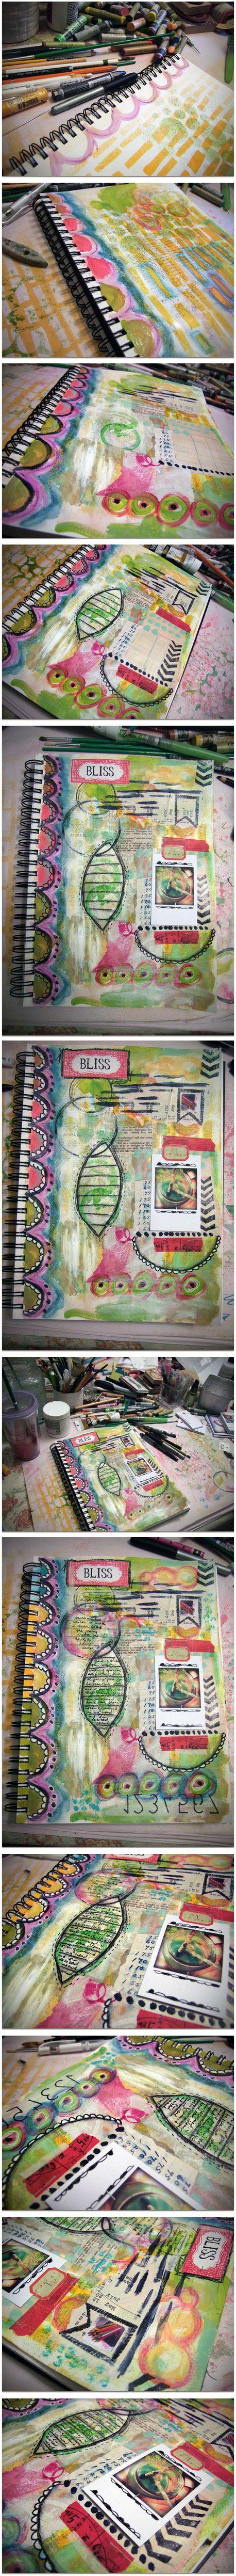 """Every Life Has a Story!"" - {Roben-Marie Smith} - Art JournalingFun..."